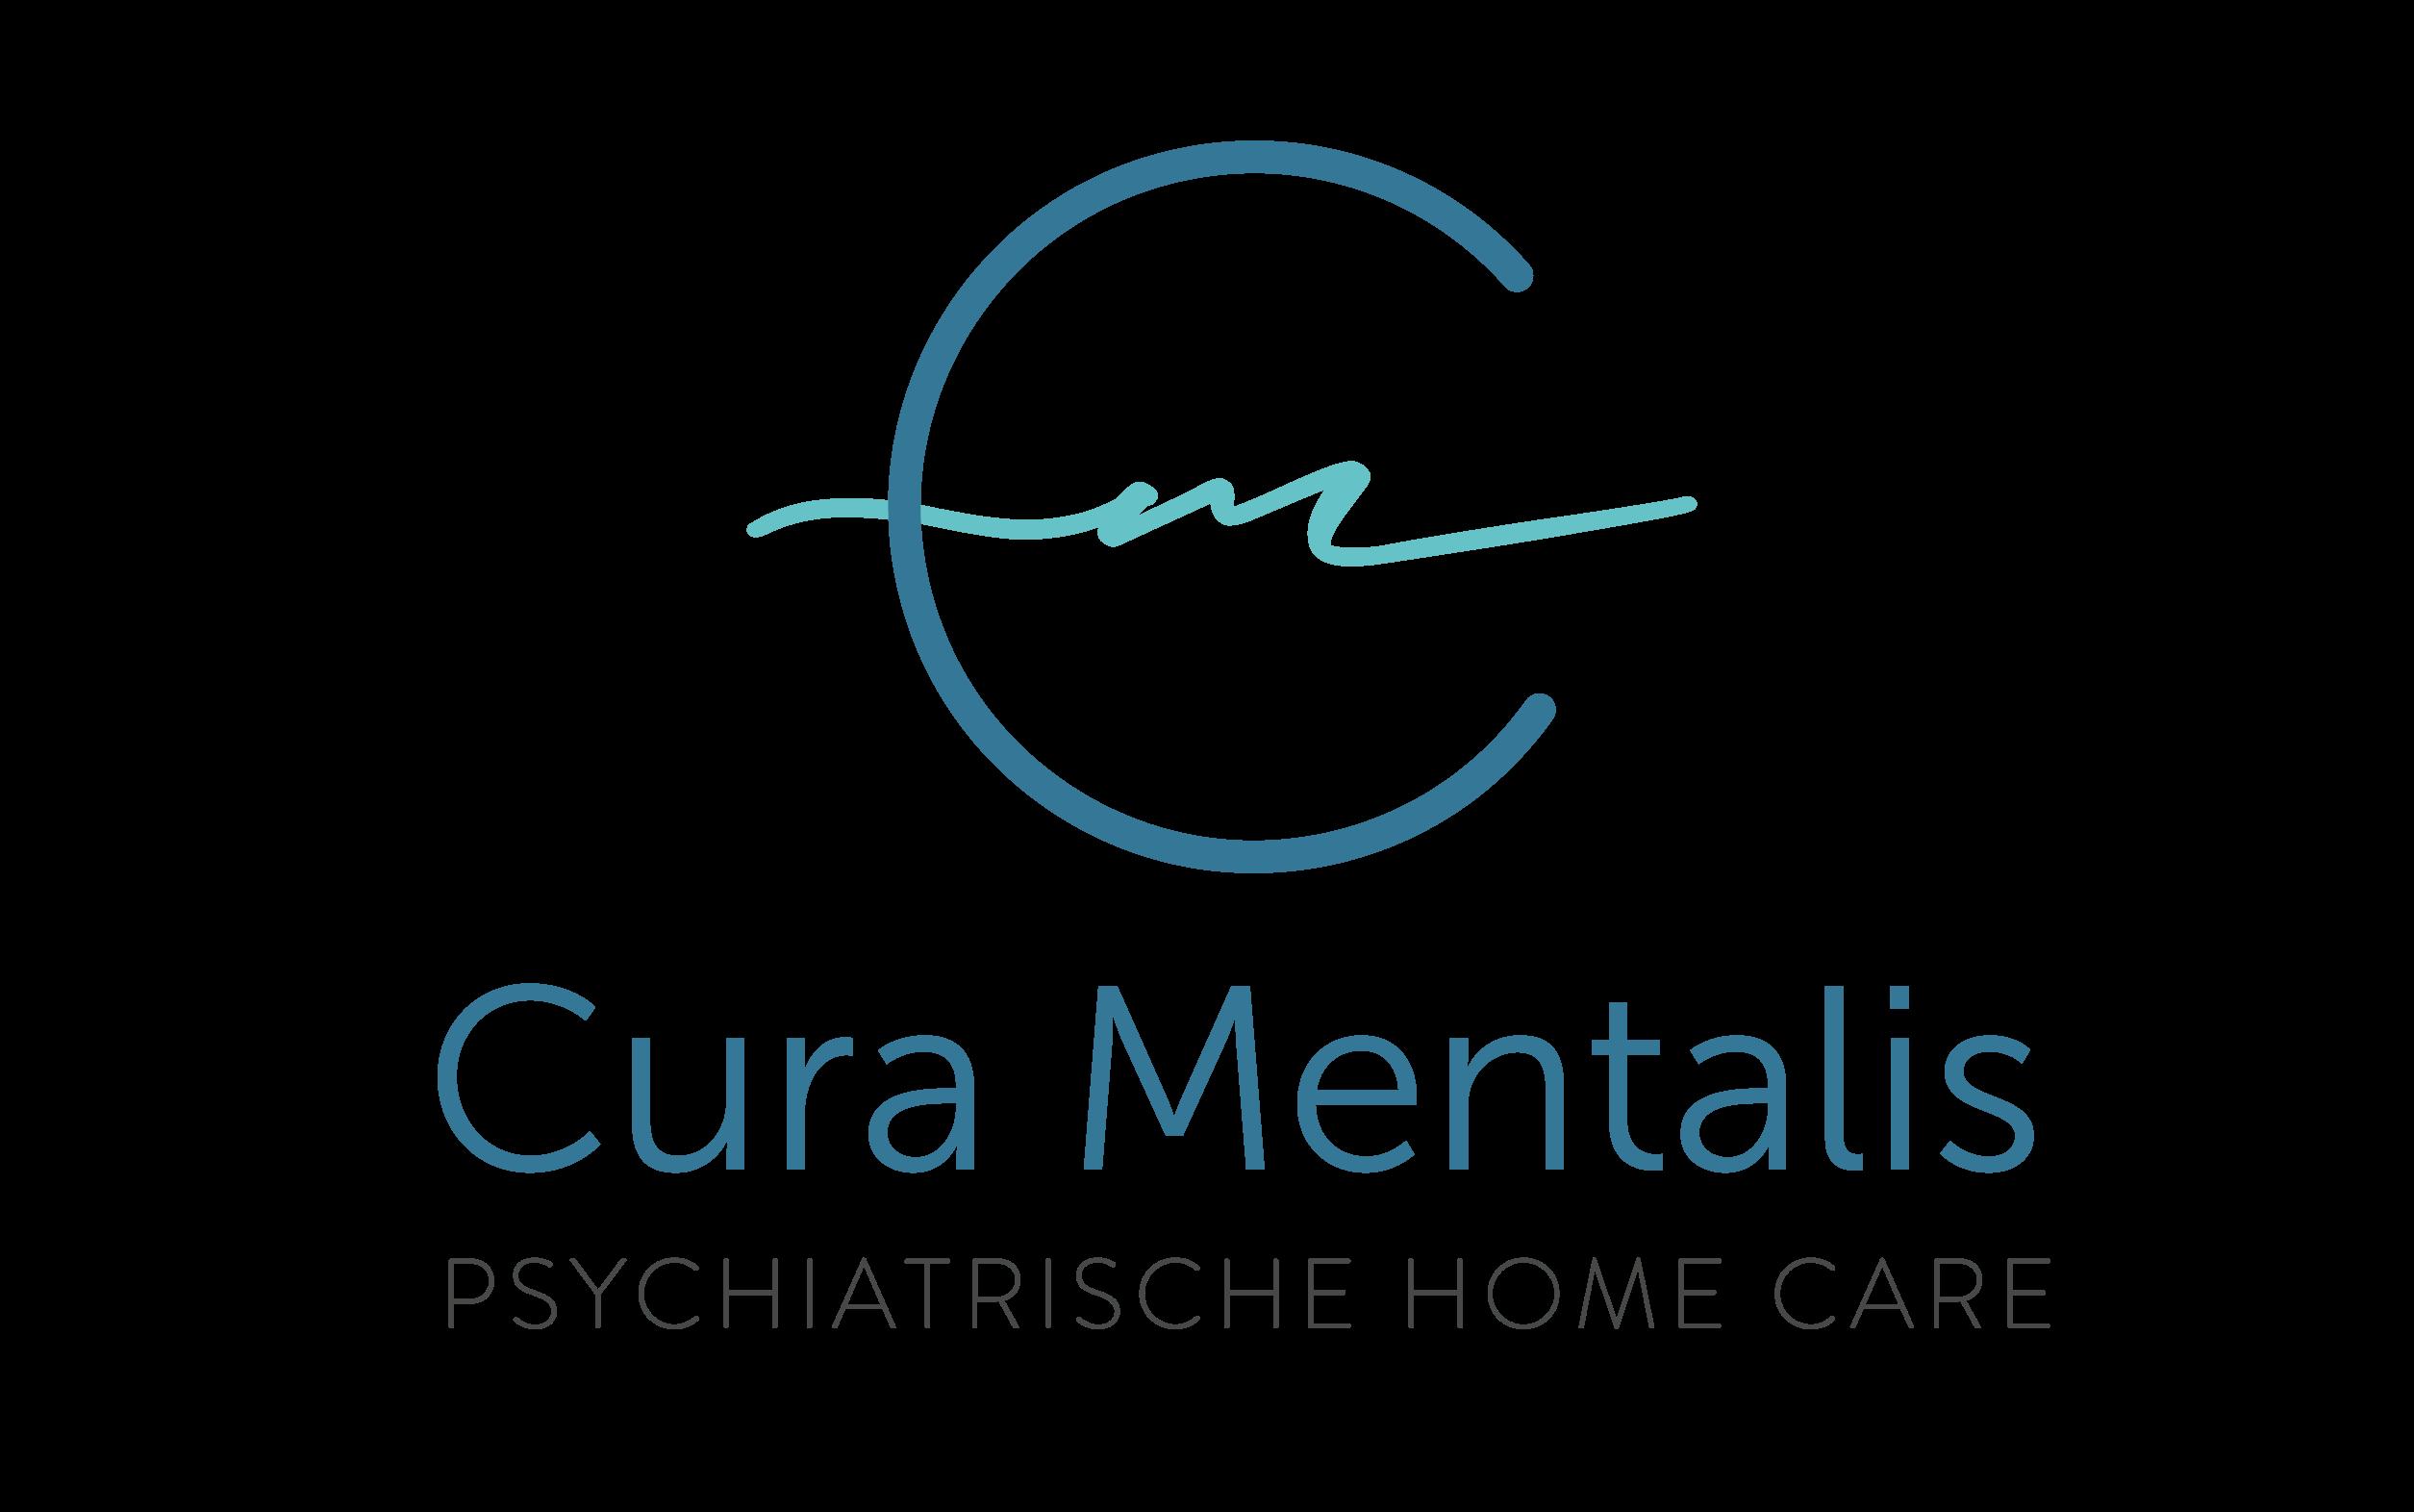 Logo Cura Mentalis farbig